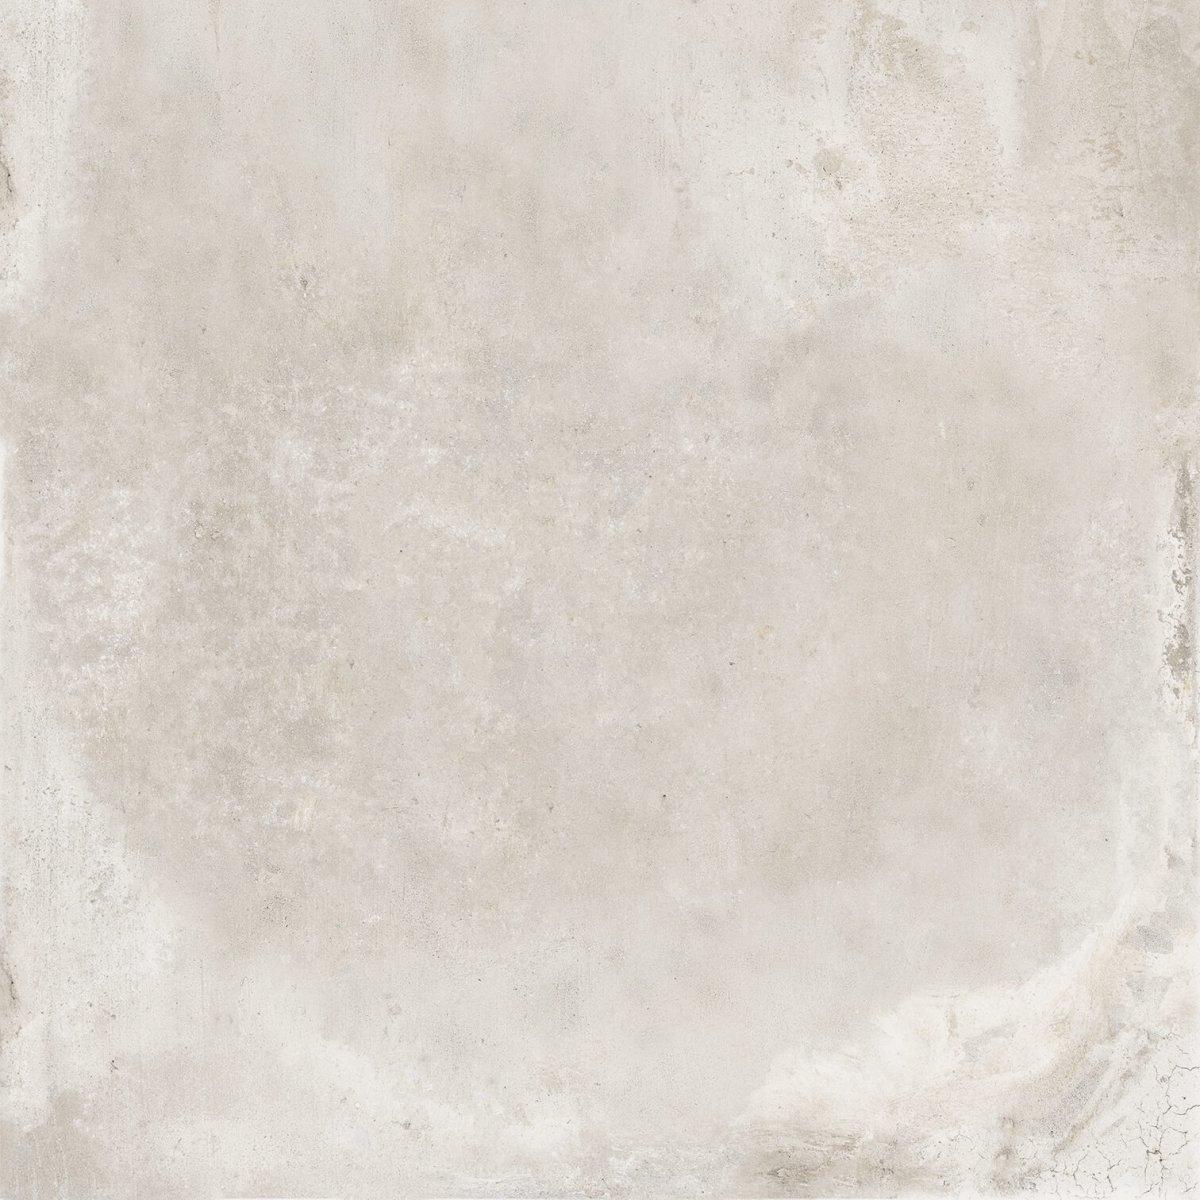 Florim Beton One Chalk 600x600mm_Stiles_Product_Image4